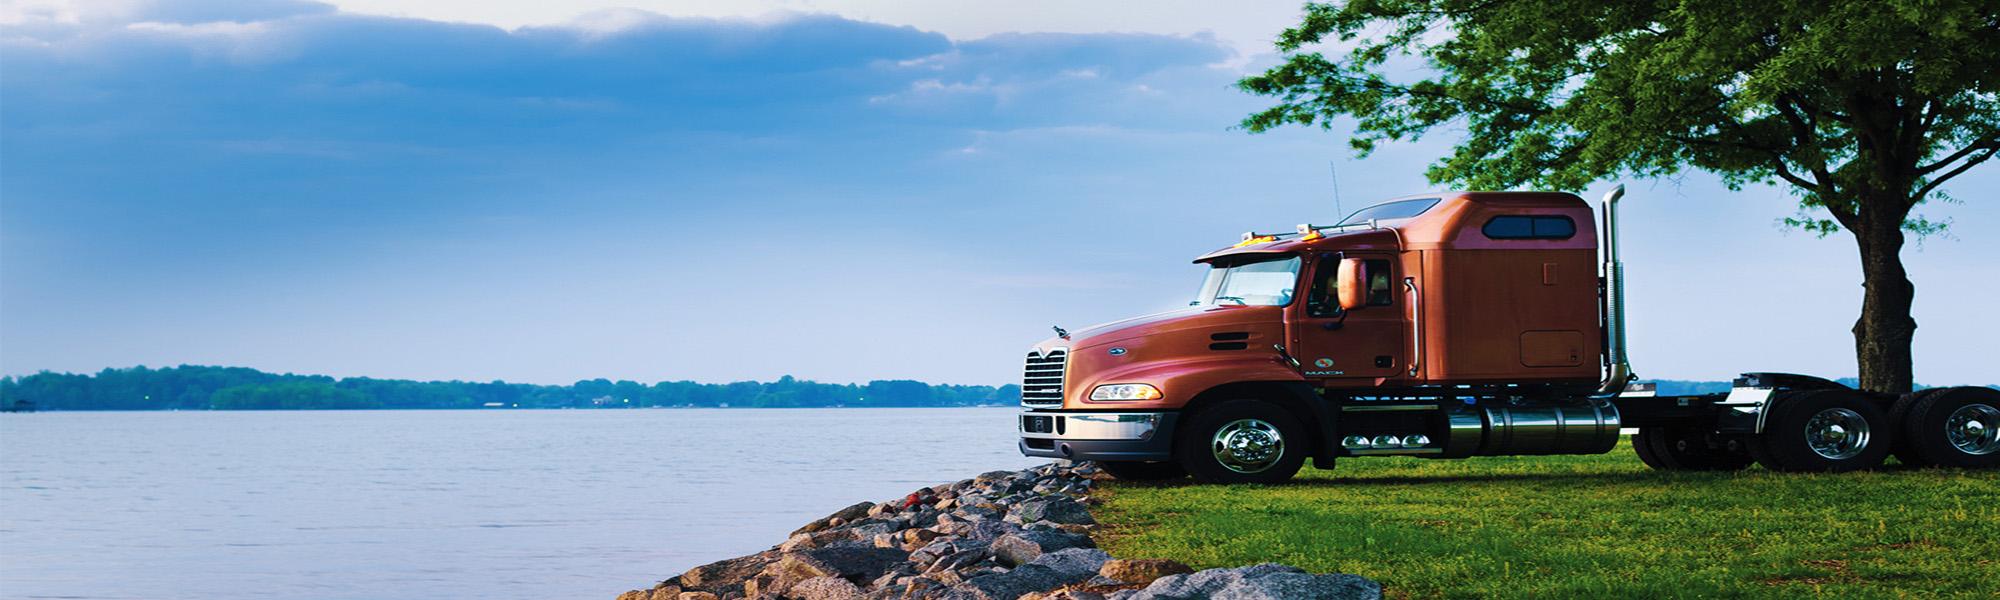 truck-header